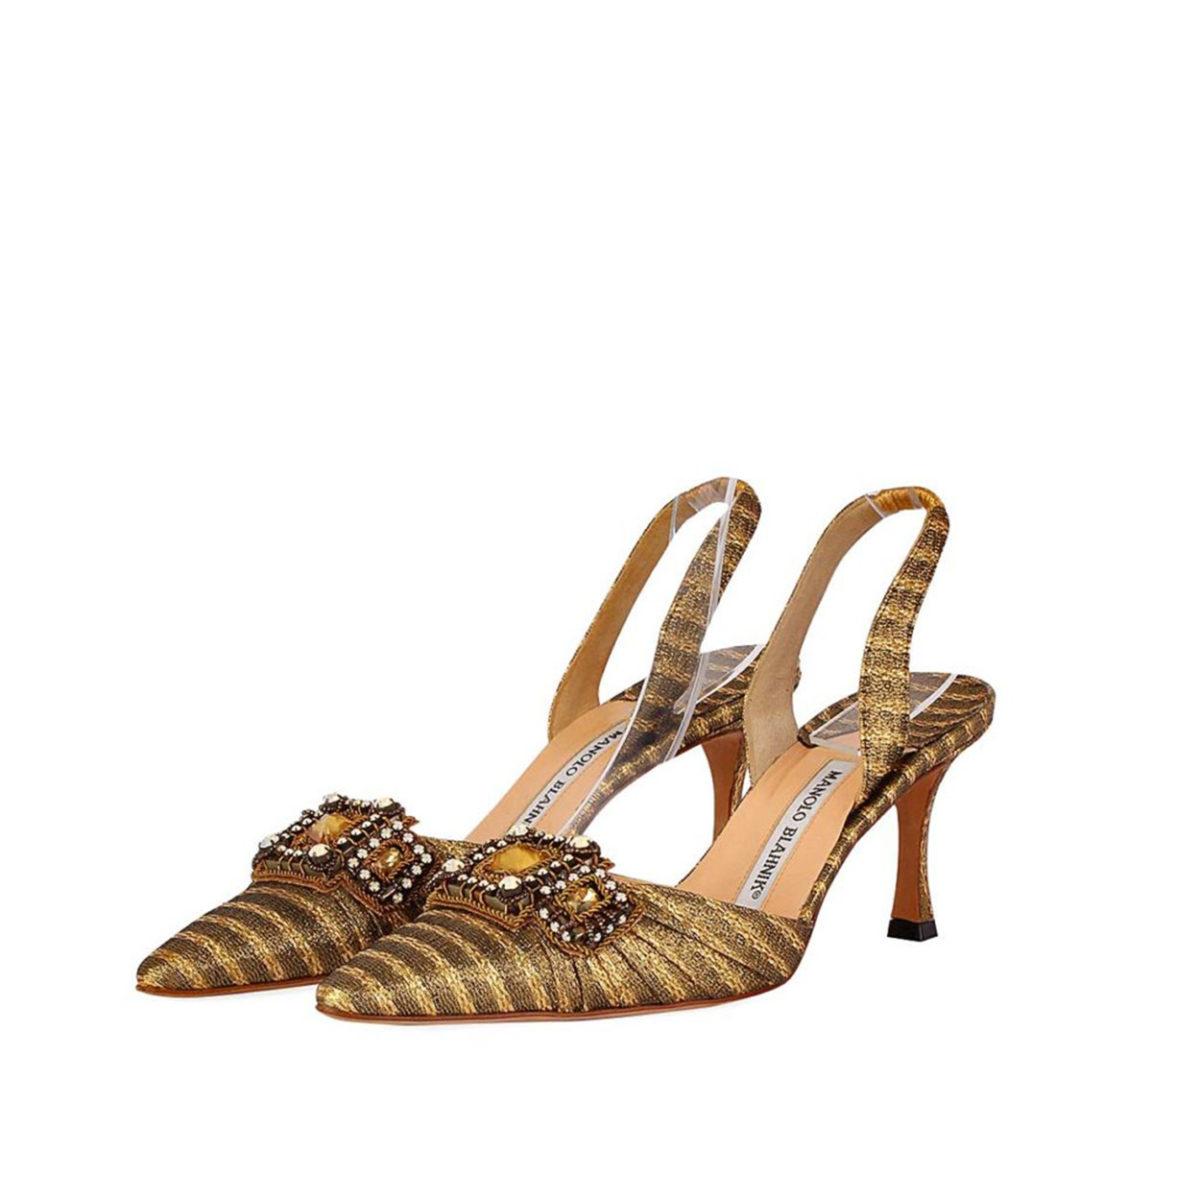 e680ebccf31 MANOLO BLAHNIK Silk Buckle Kitten Heel Carolyne Slingbacks Gold - S ...